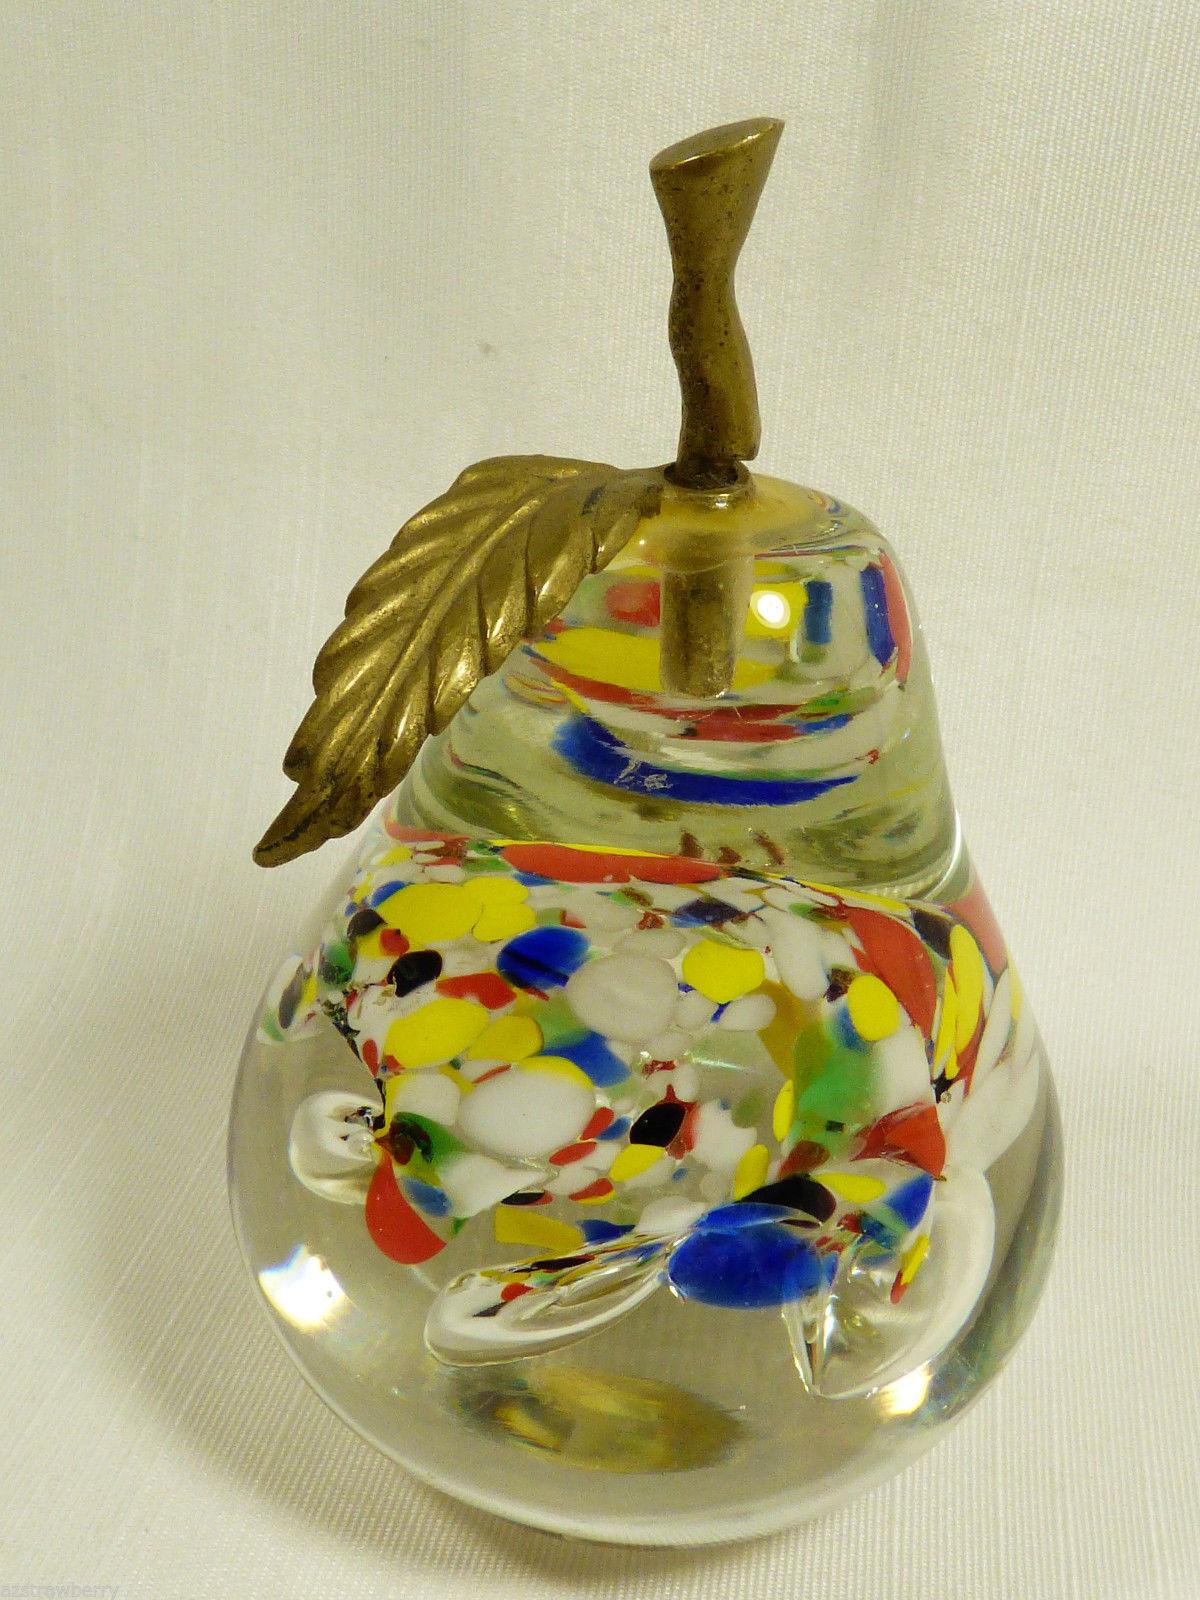 VTG ART CLEAR & SPECKLED GLASS PEAR BRASS STEM & LEAF PAPERWEIGHT FIGURINE